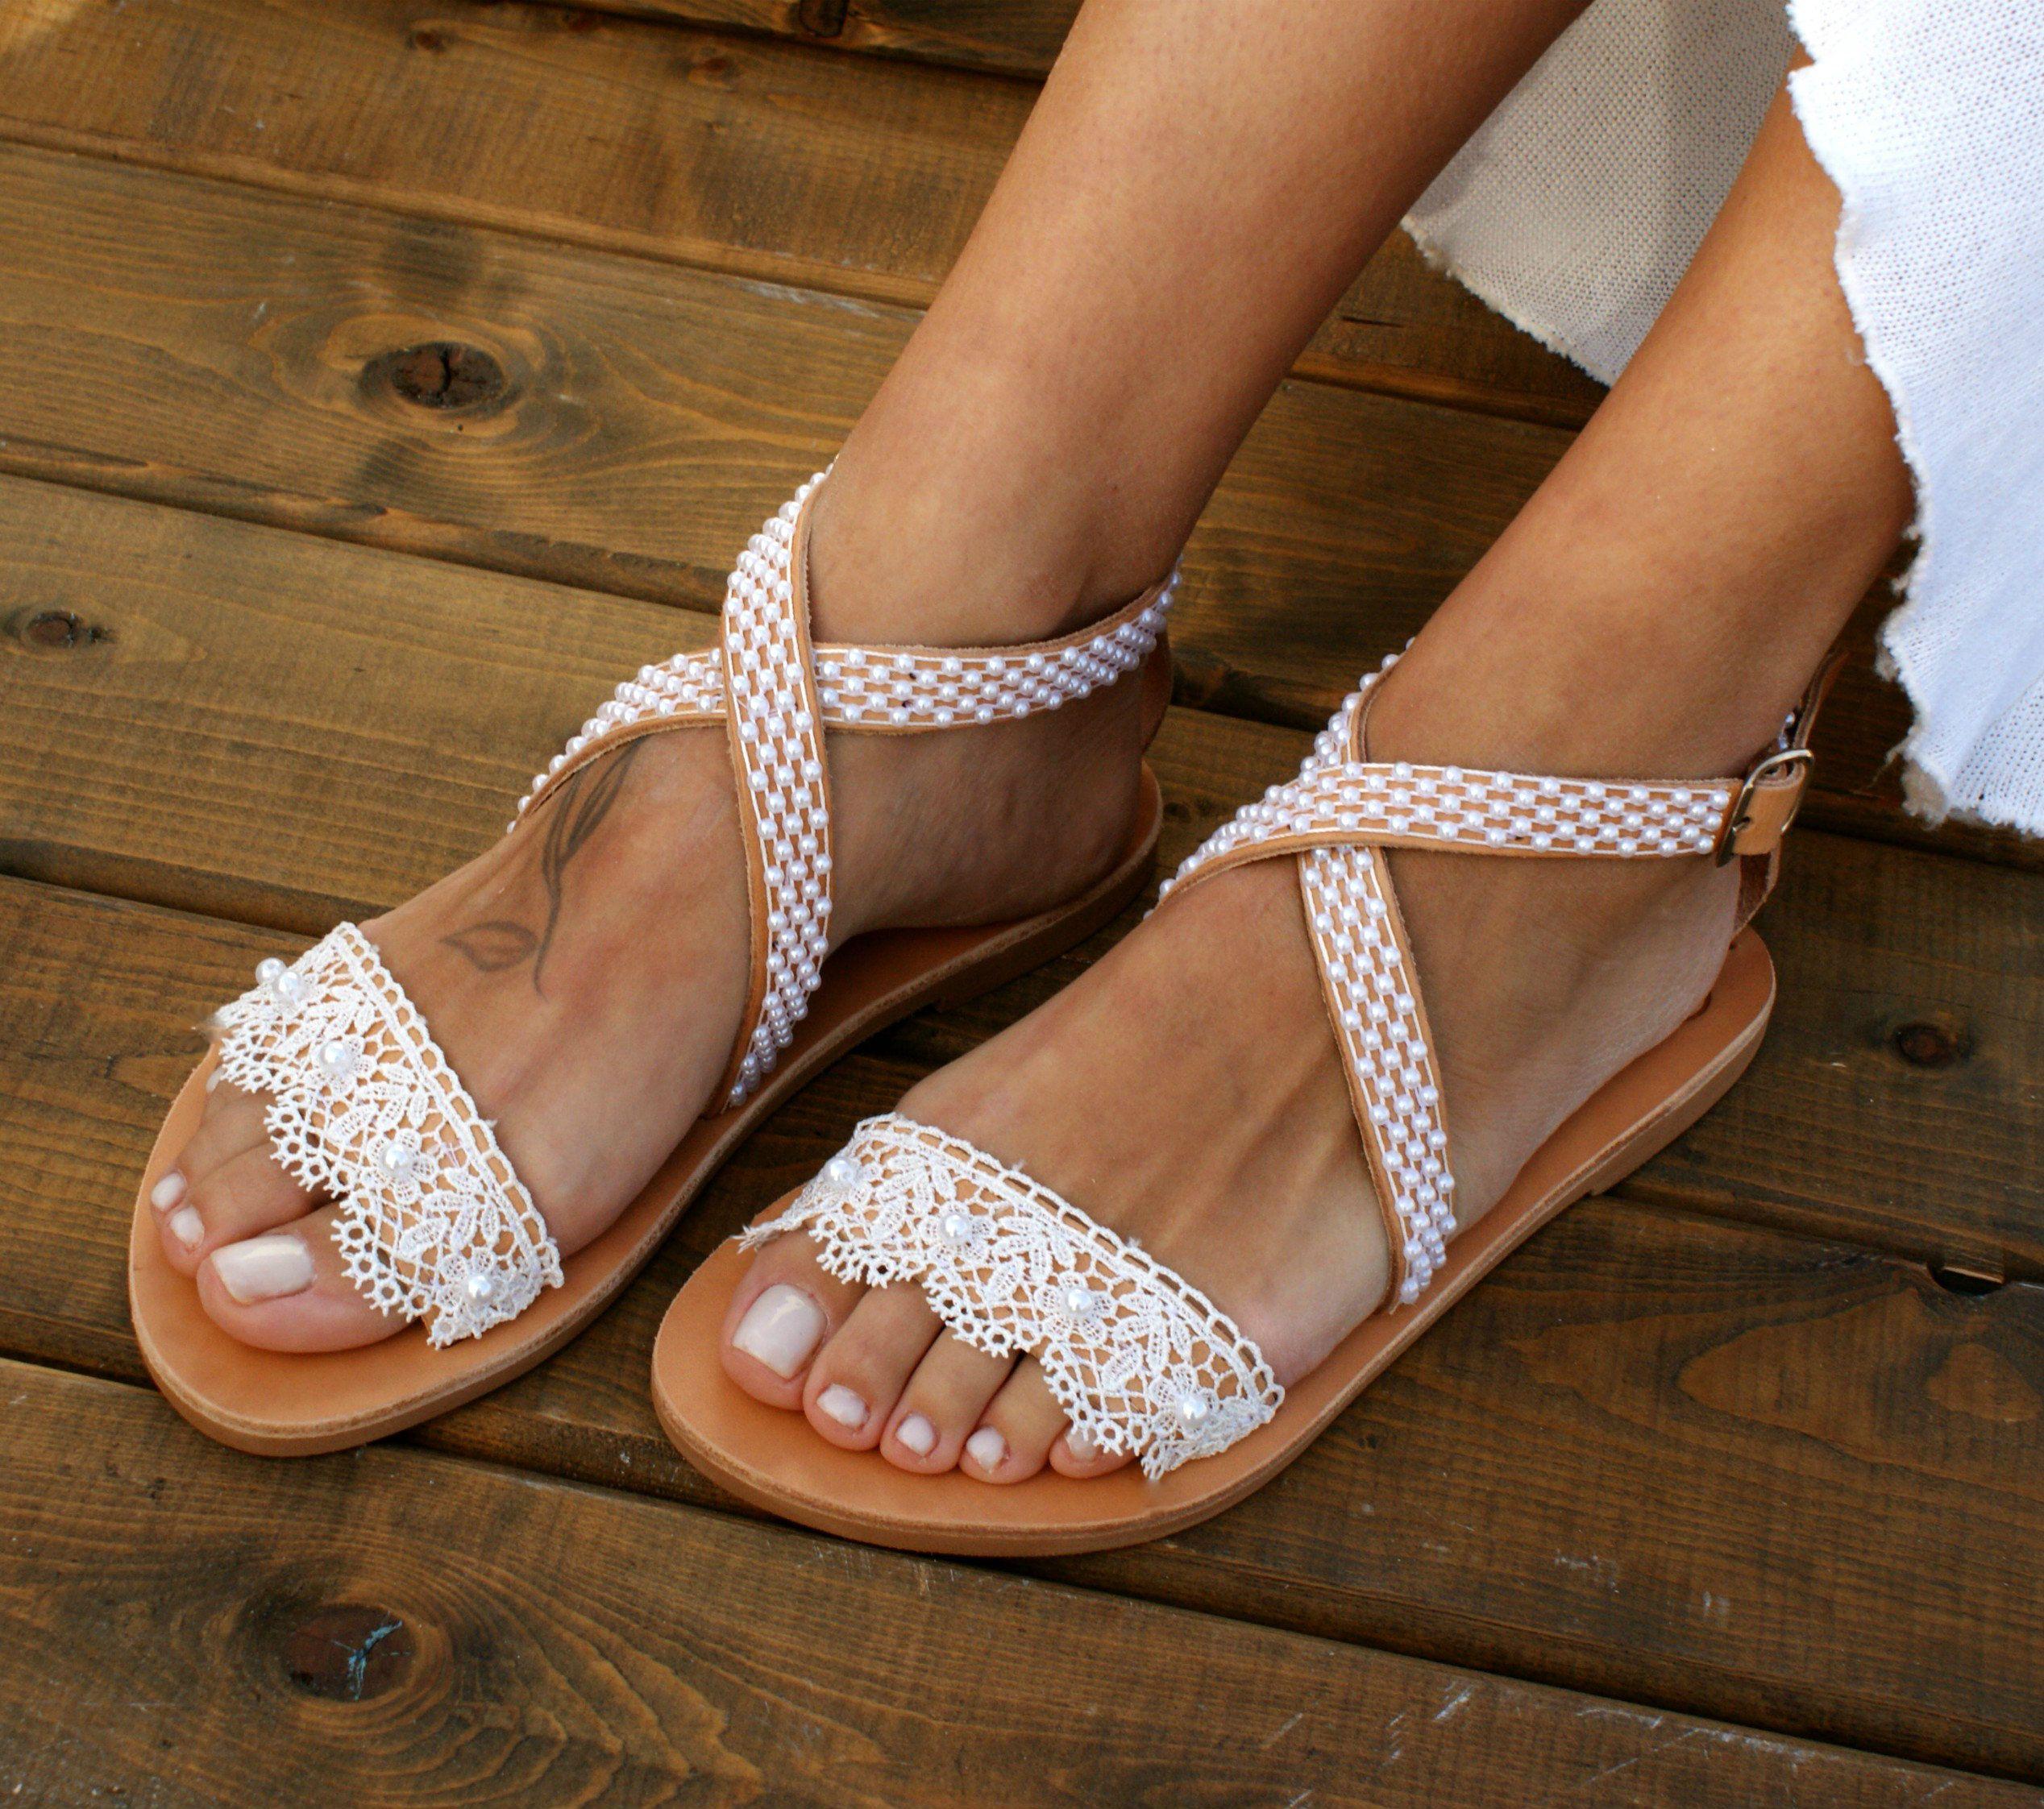 726ff67ff953e Wedding sandals/ white lace bridal sandals/ leather sandals ...